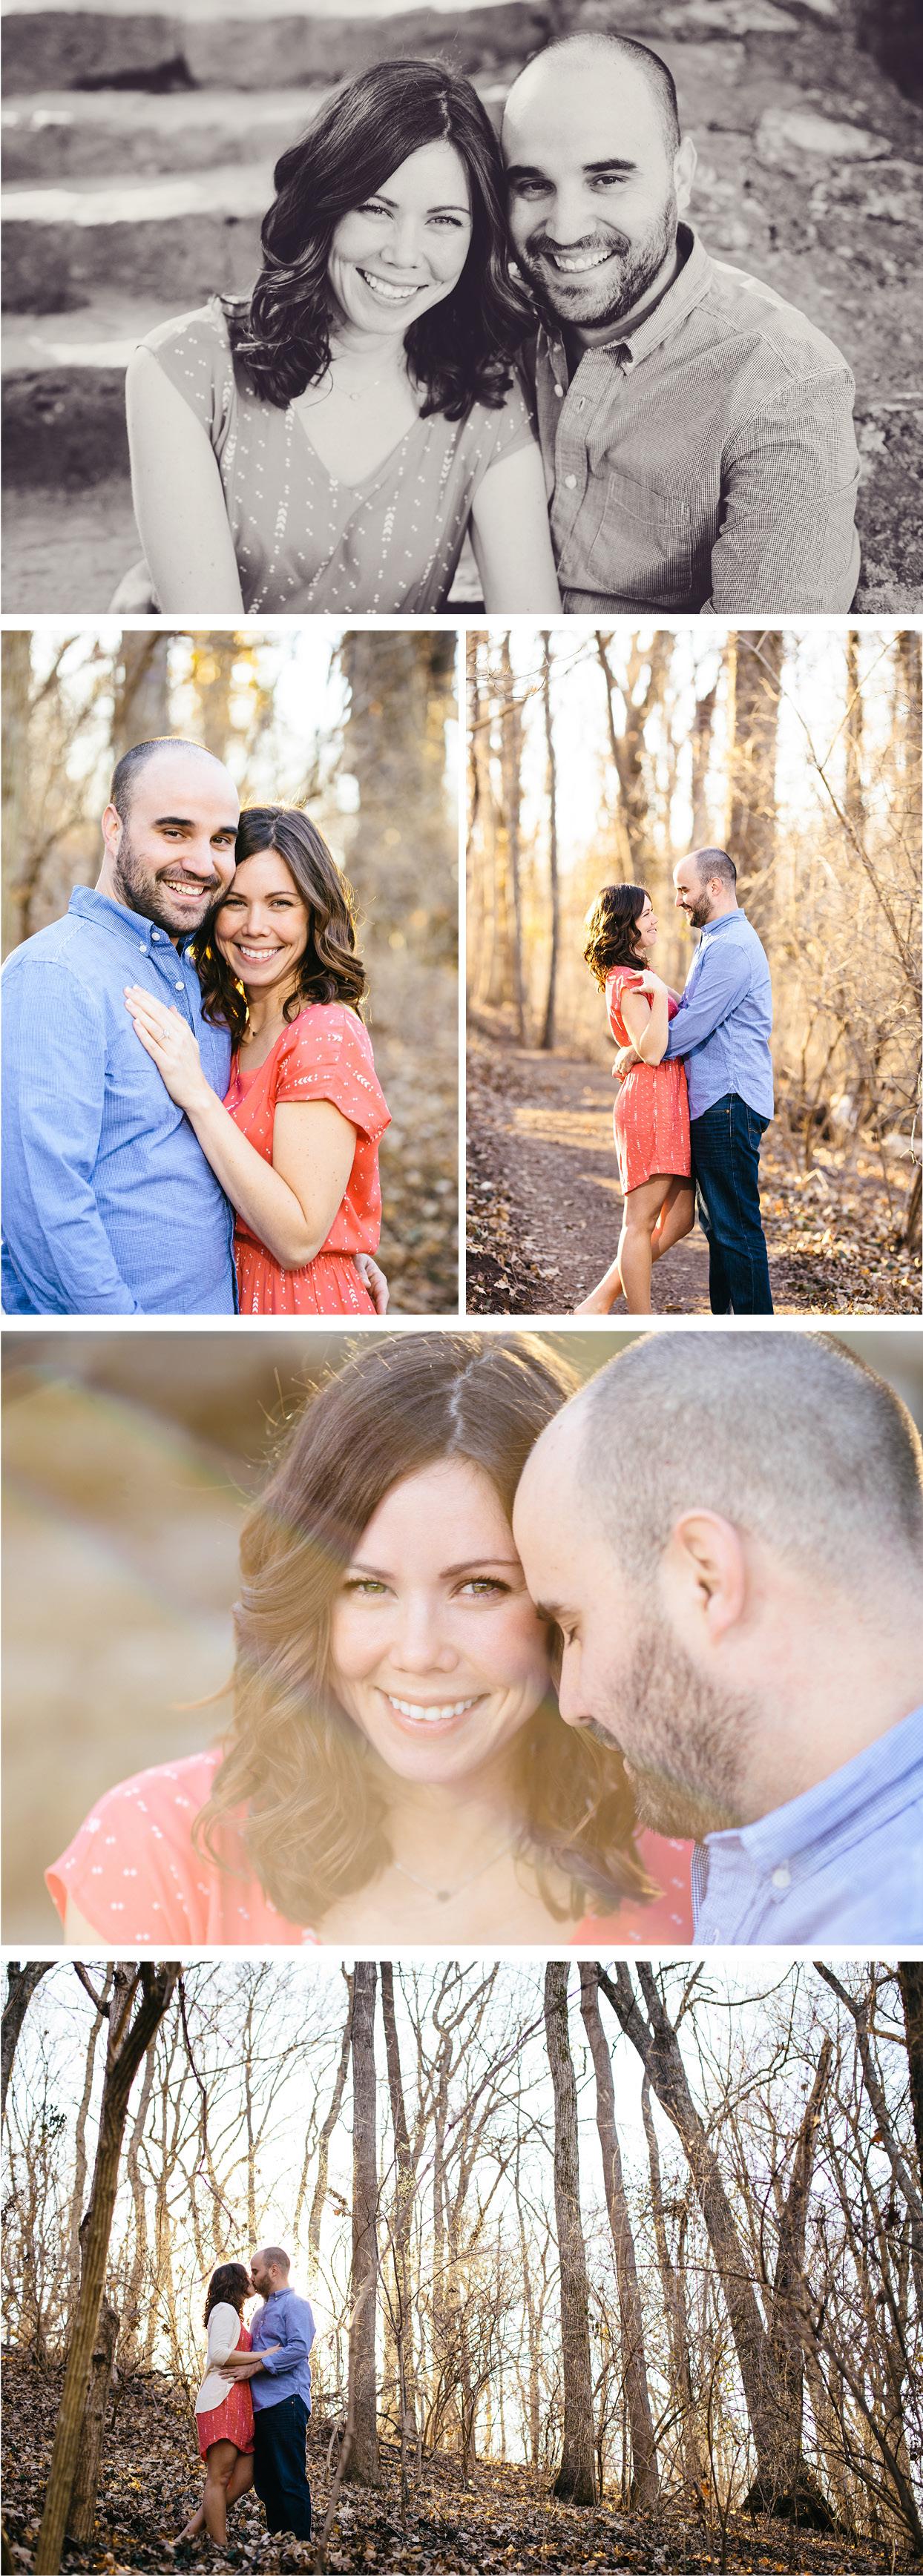 CK-Photo-Nashville-engagement-photographer-km3.jpg